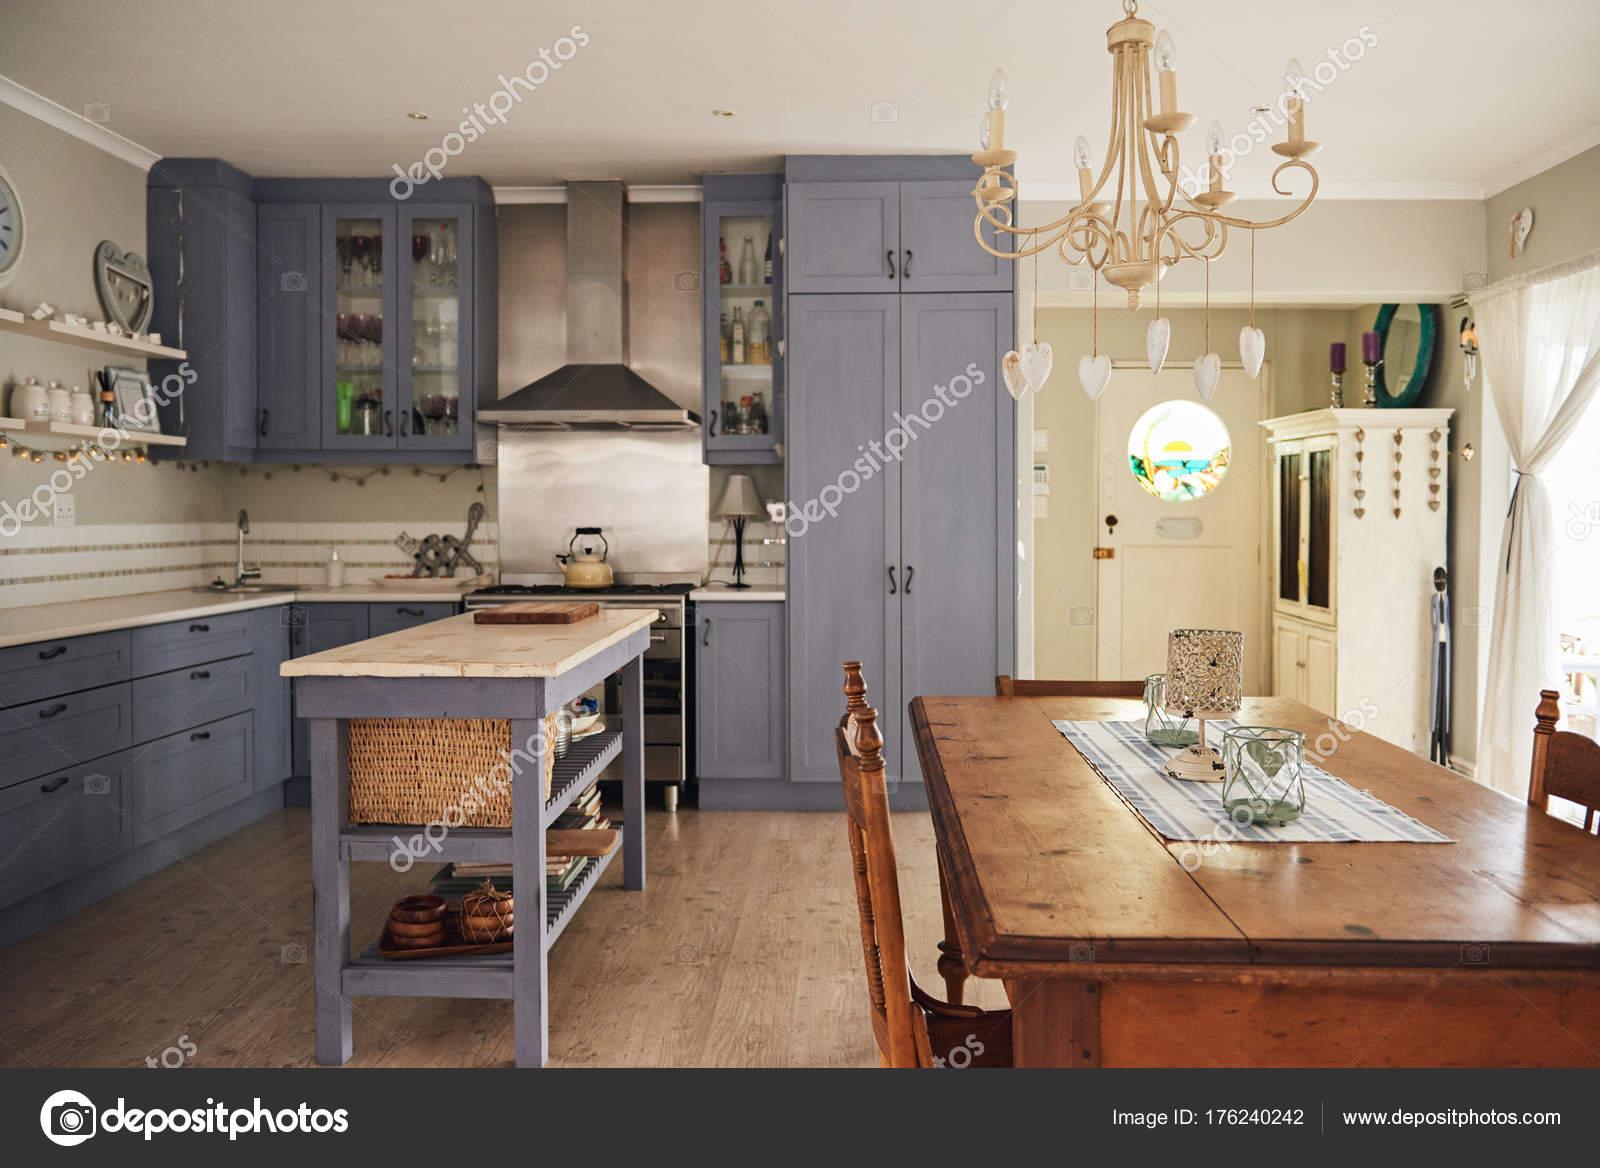 cocina estilo Country — Fotos de Stock © mavoimages #176240242